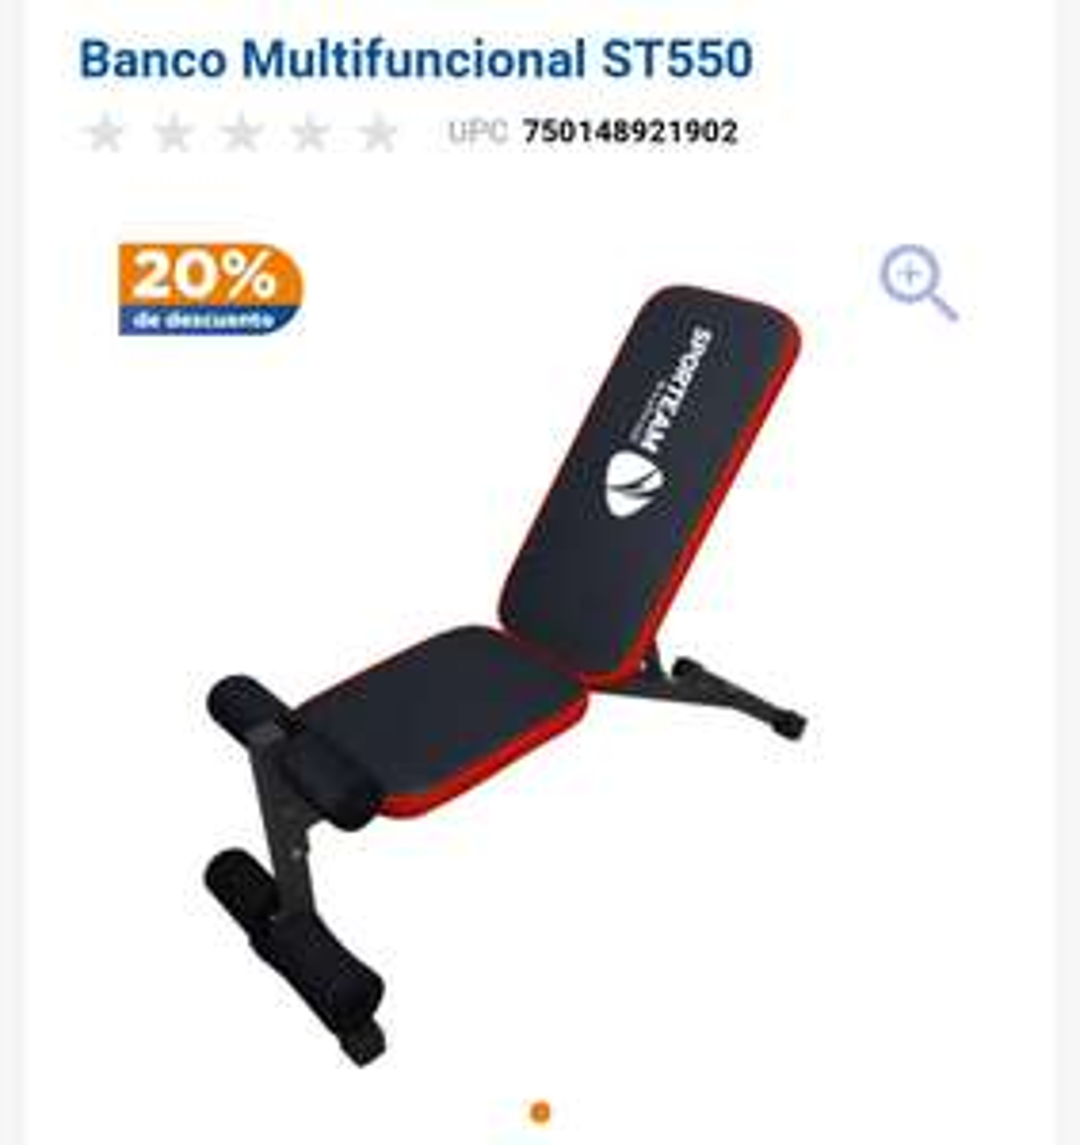 Chedraui: Banco Multifuncional ST550